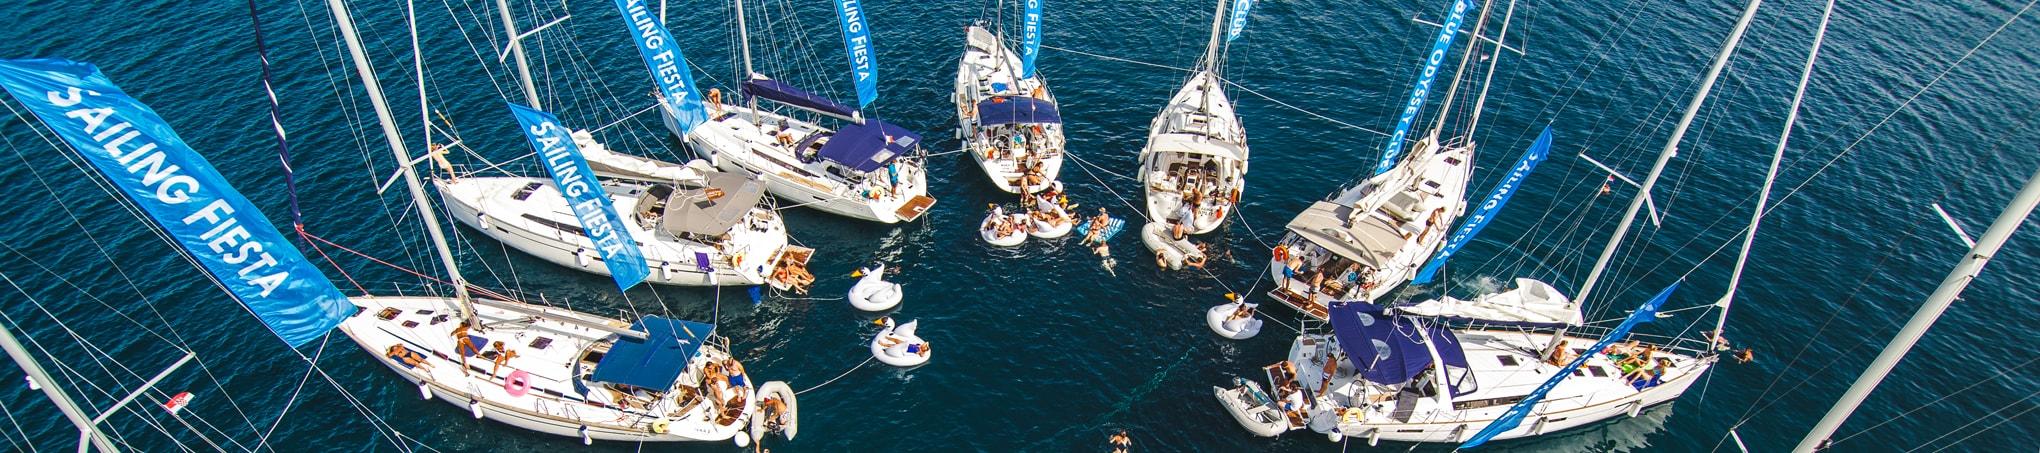 TheSailingFiesta-panorama-sailing-yacht